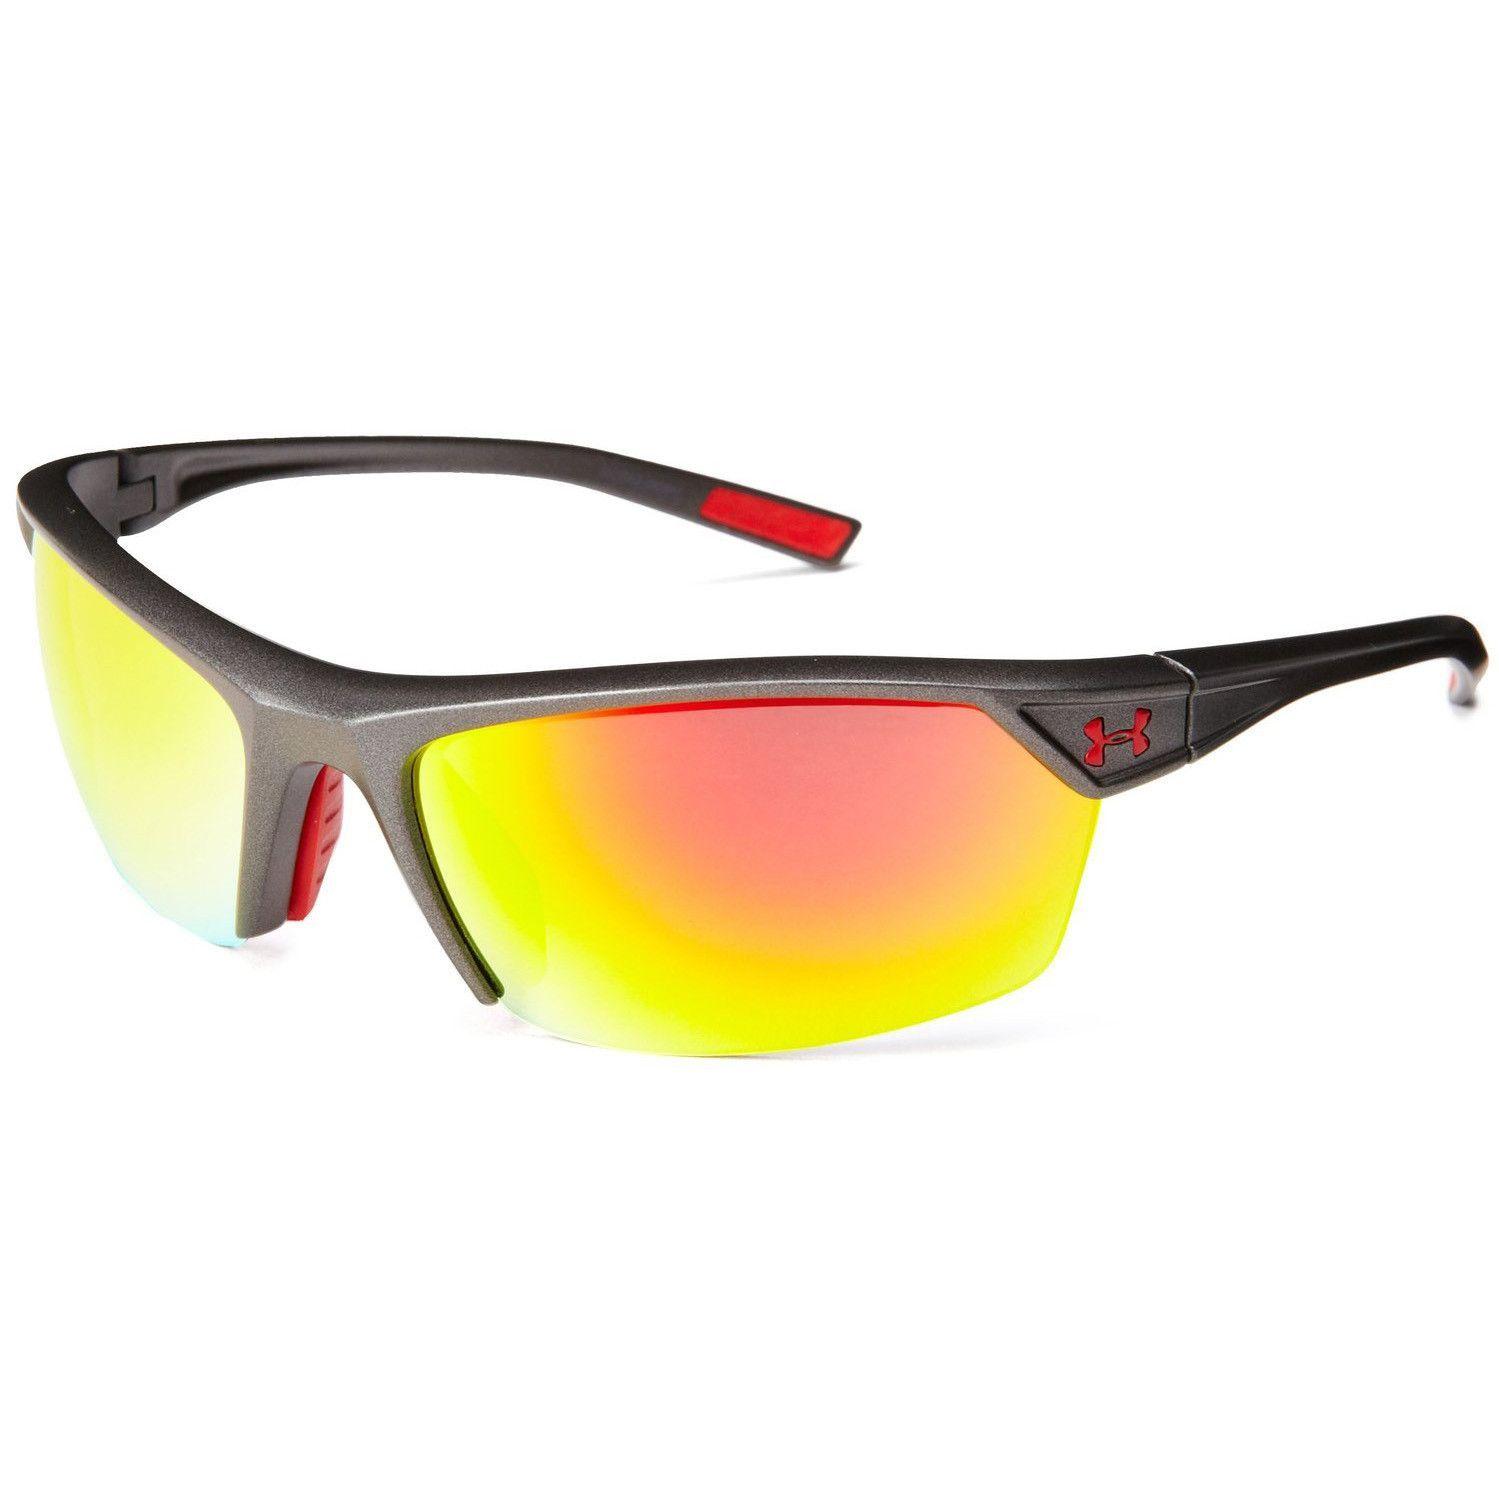 0054c02cee2bc Under Armour UA Zone 2.0 Sunglasses Satin Carbon Grey Frame Orange Mirror  Lens